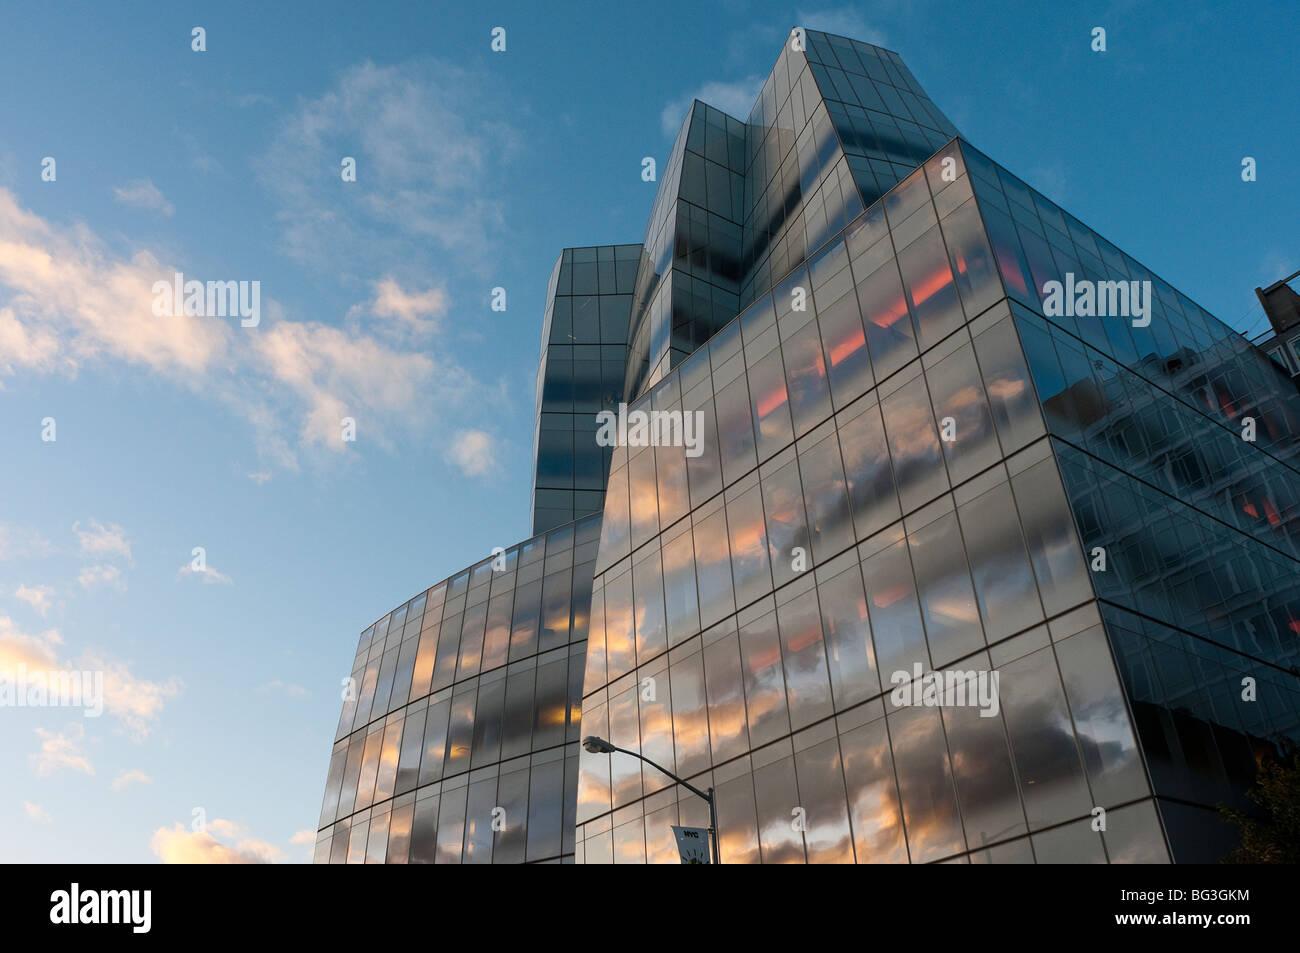 New York, NY - 7 september 2009- IAC Center designed by Frank Gehry - Stock Image